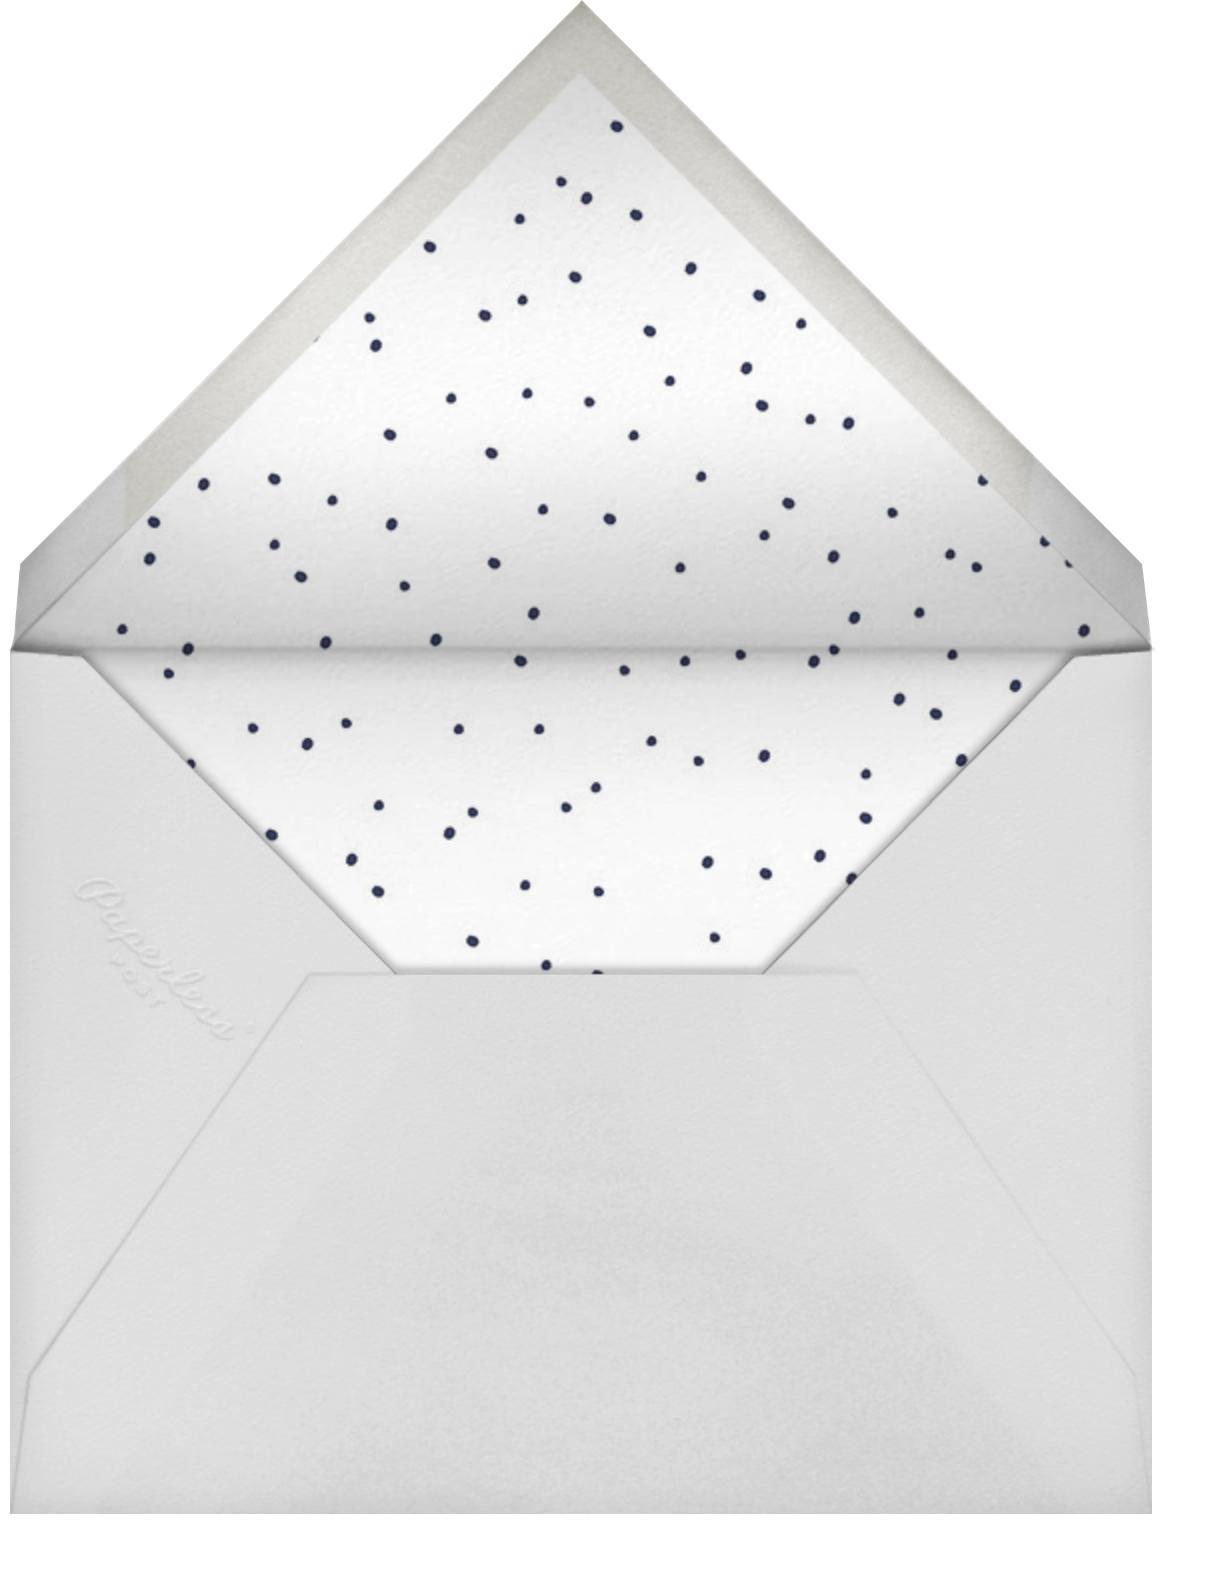 Brilliant Boy - Navy - Linda and Harriett - Baby shower - envelope back